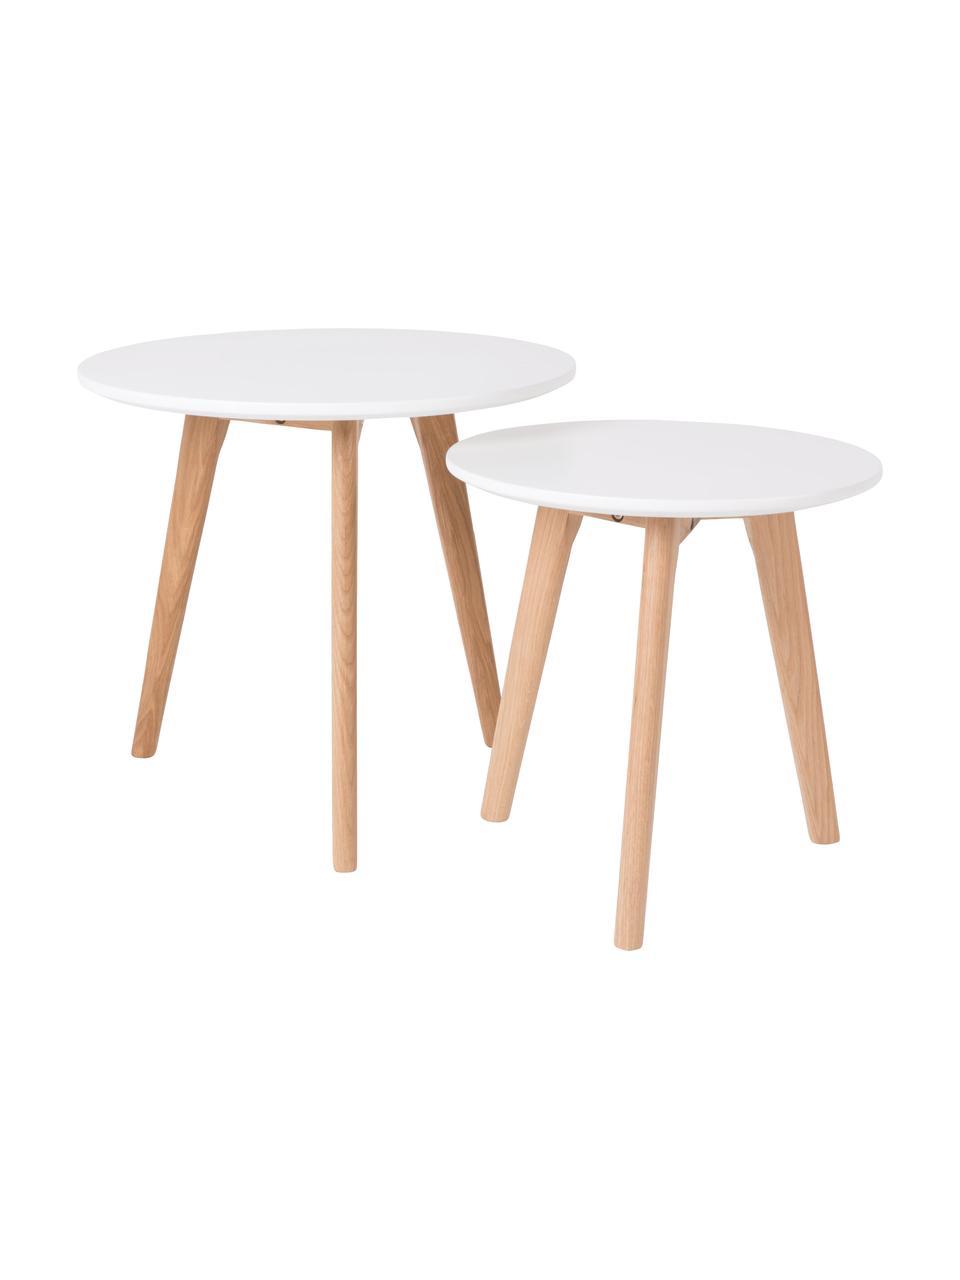 table d appoint ronde scandinave bodine 2 elem